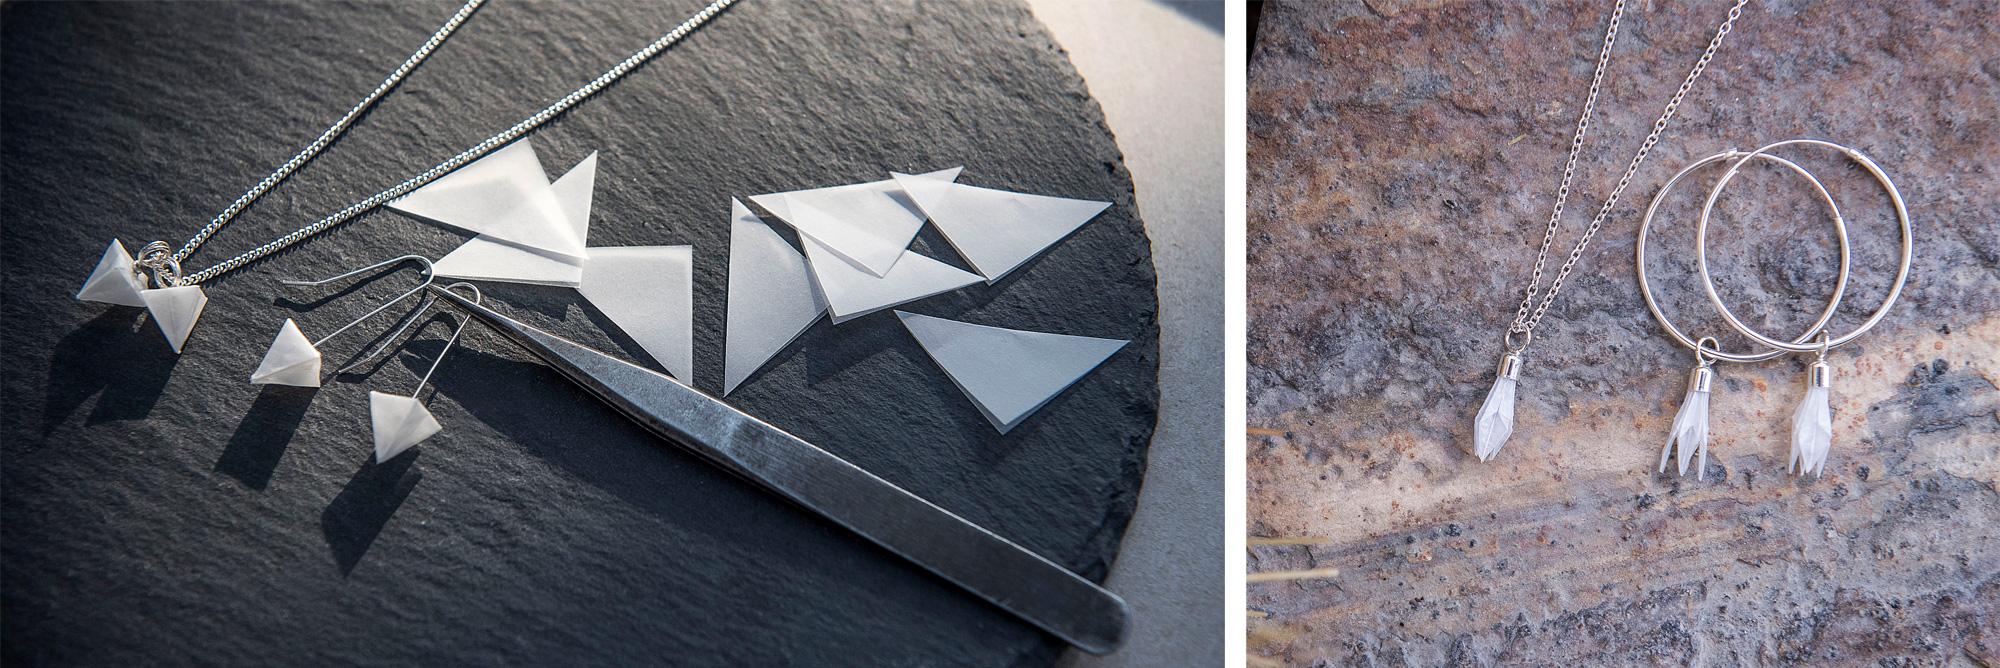 CARORAUE design made for paper